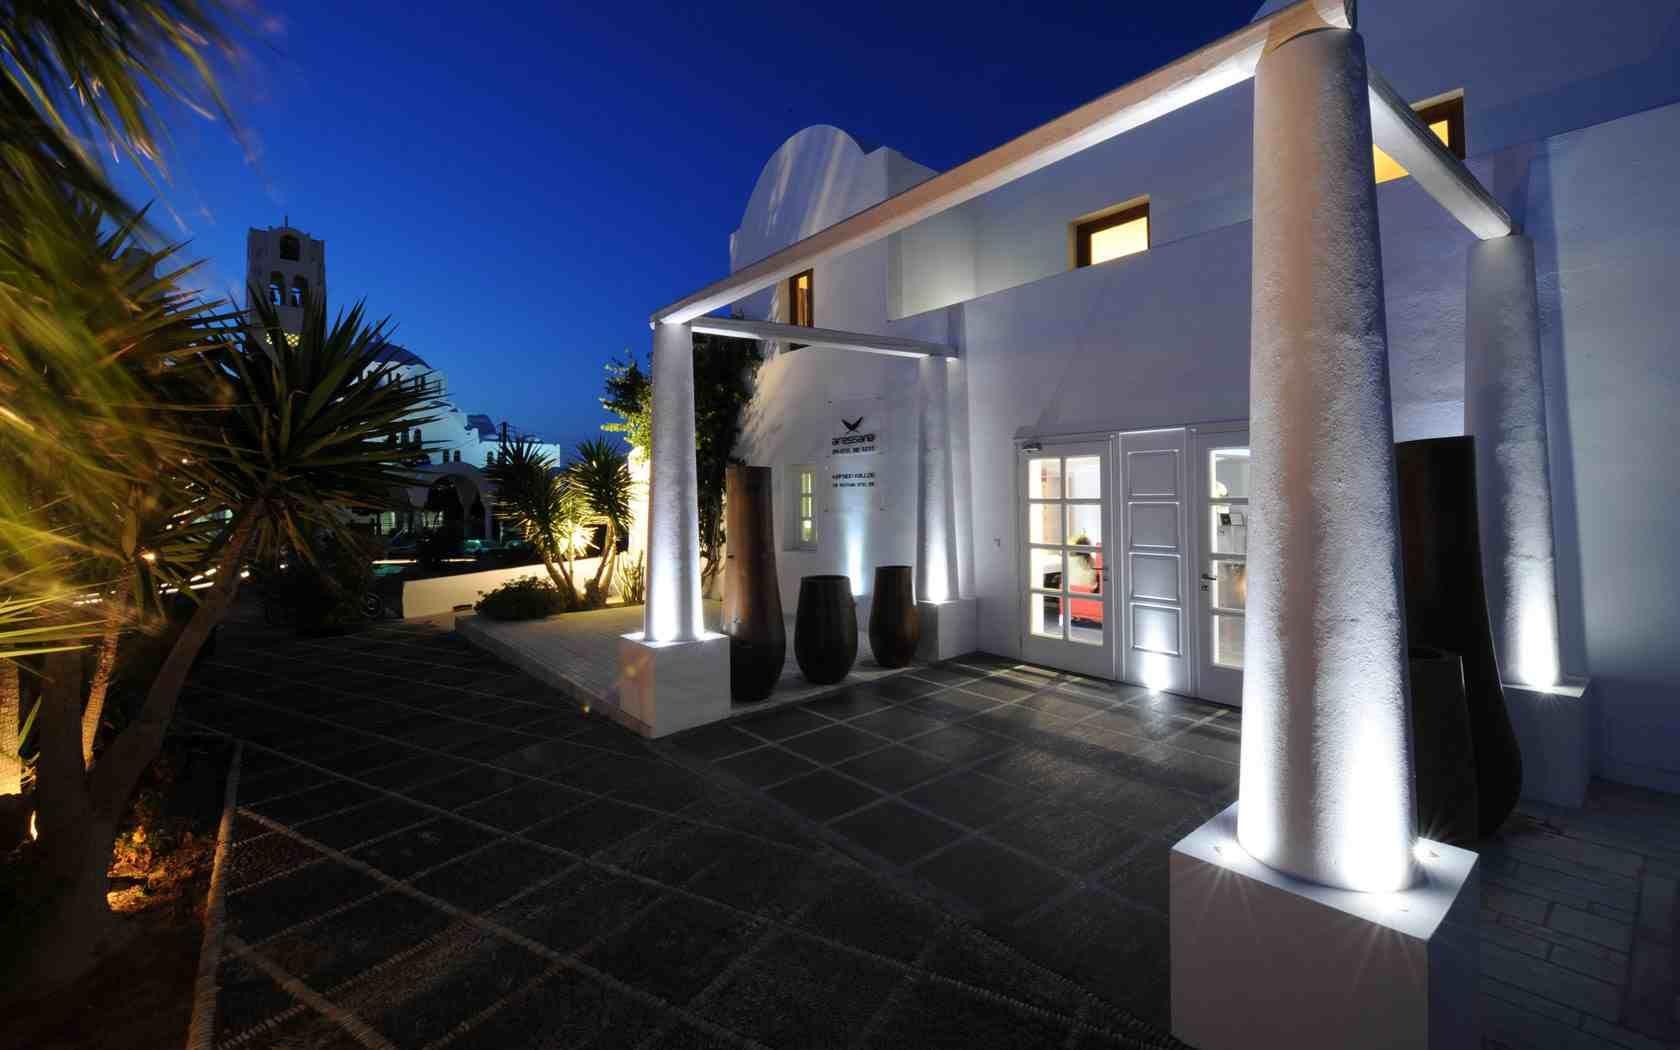 Aressana Spa Hotel Suites Santorini 5 Star Hotels Fira Santorini